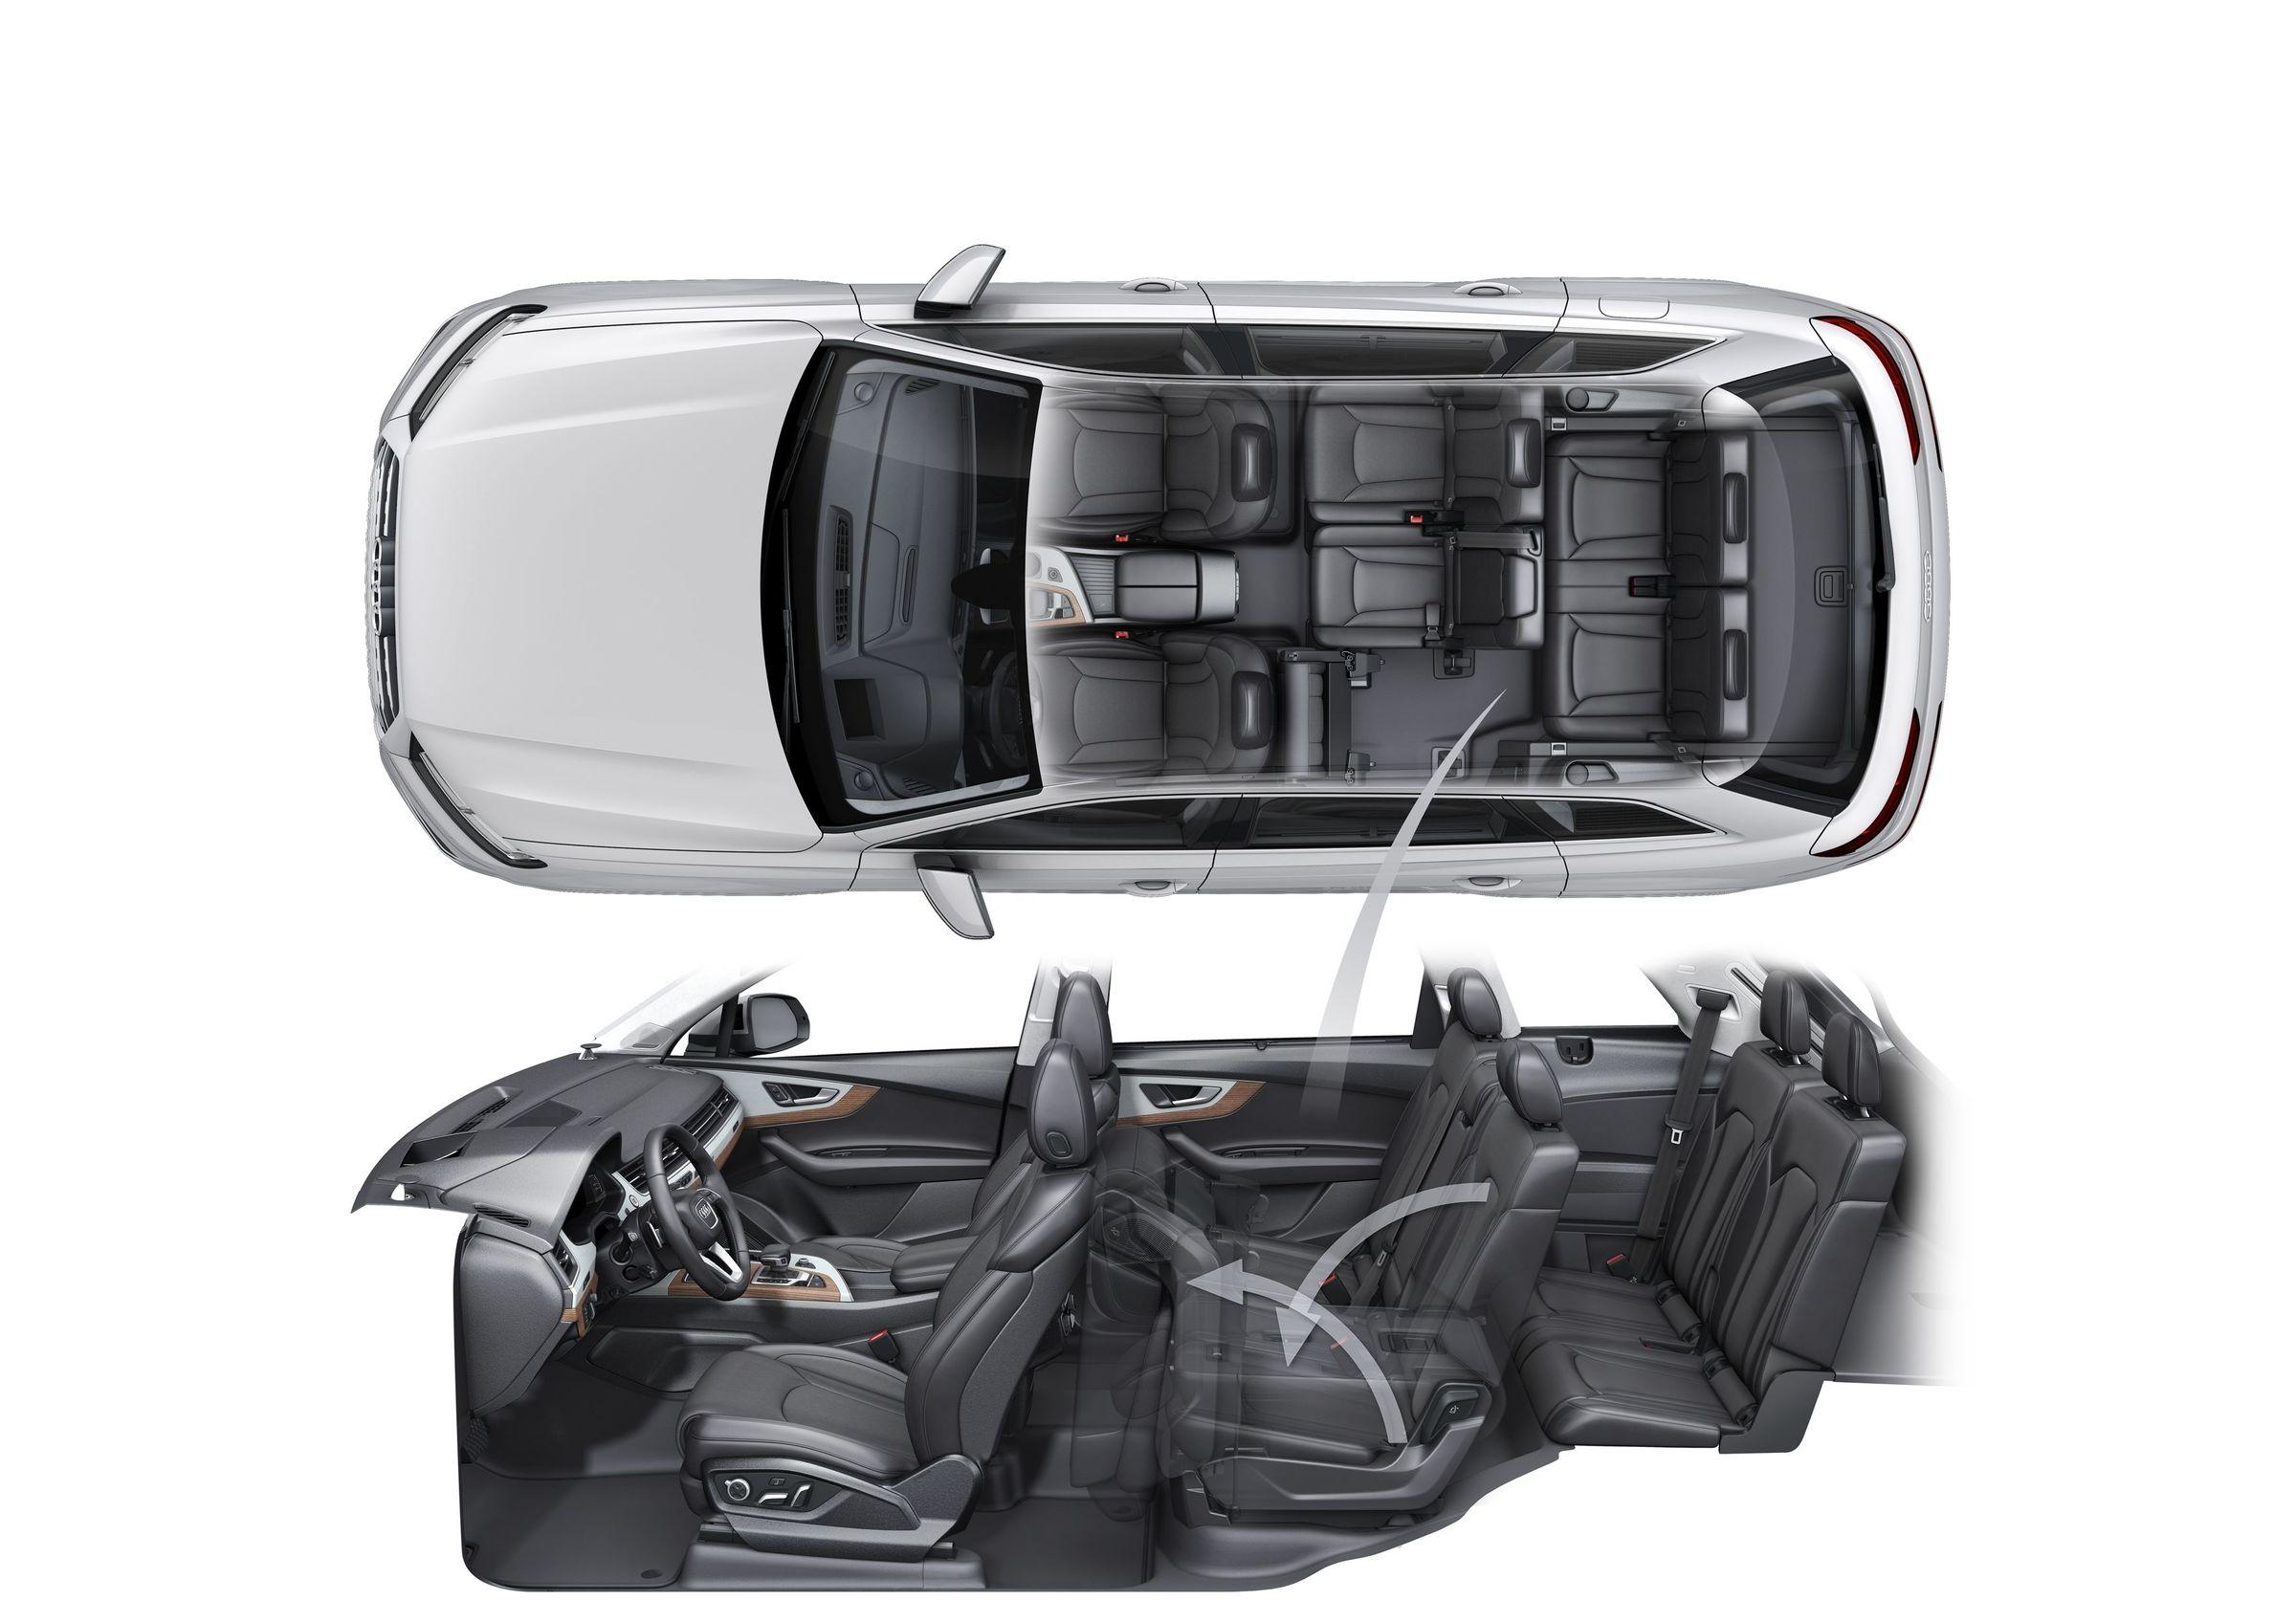 Das Interieur | Audi MediaCenter